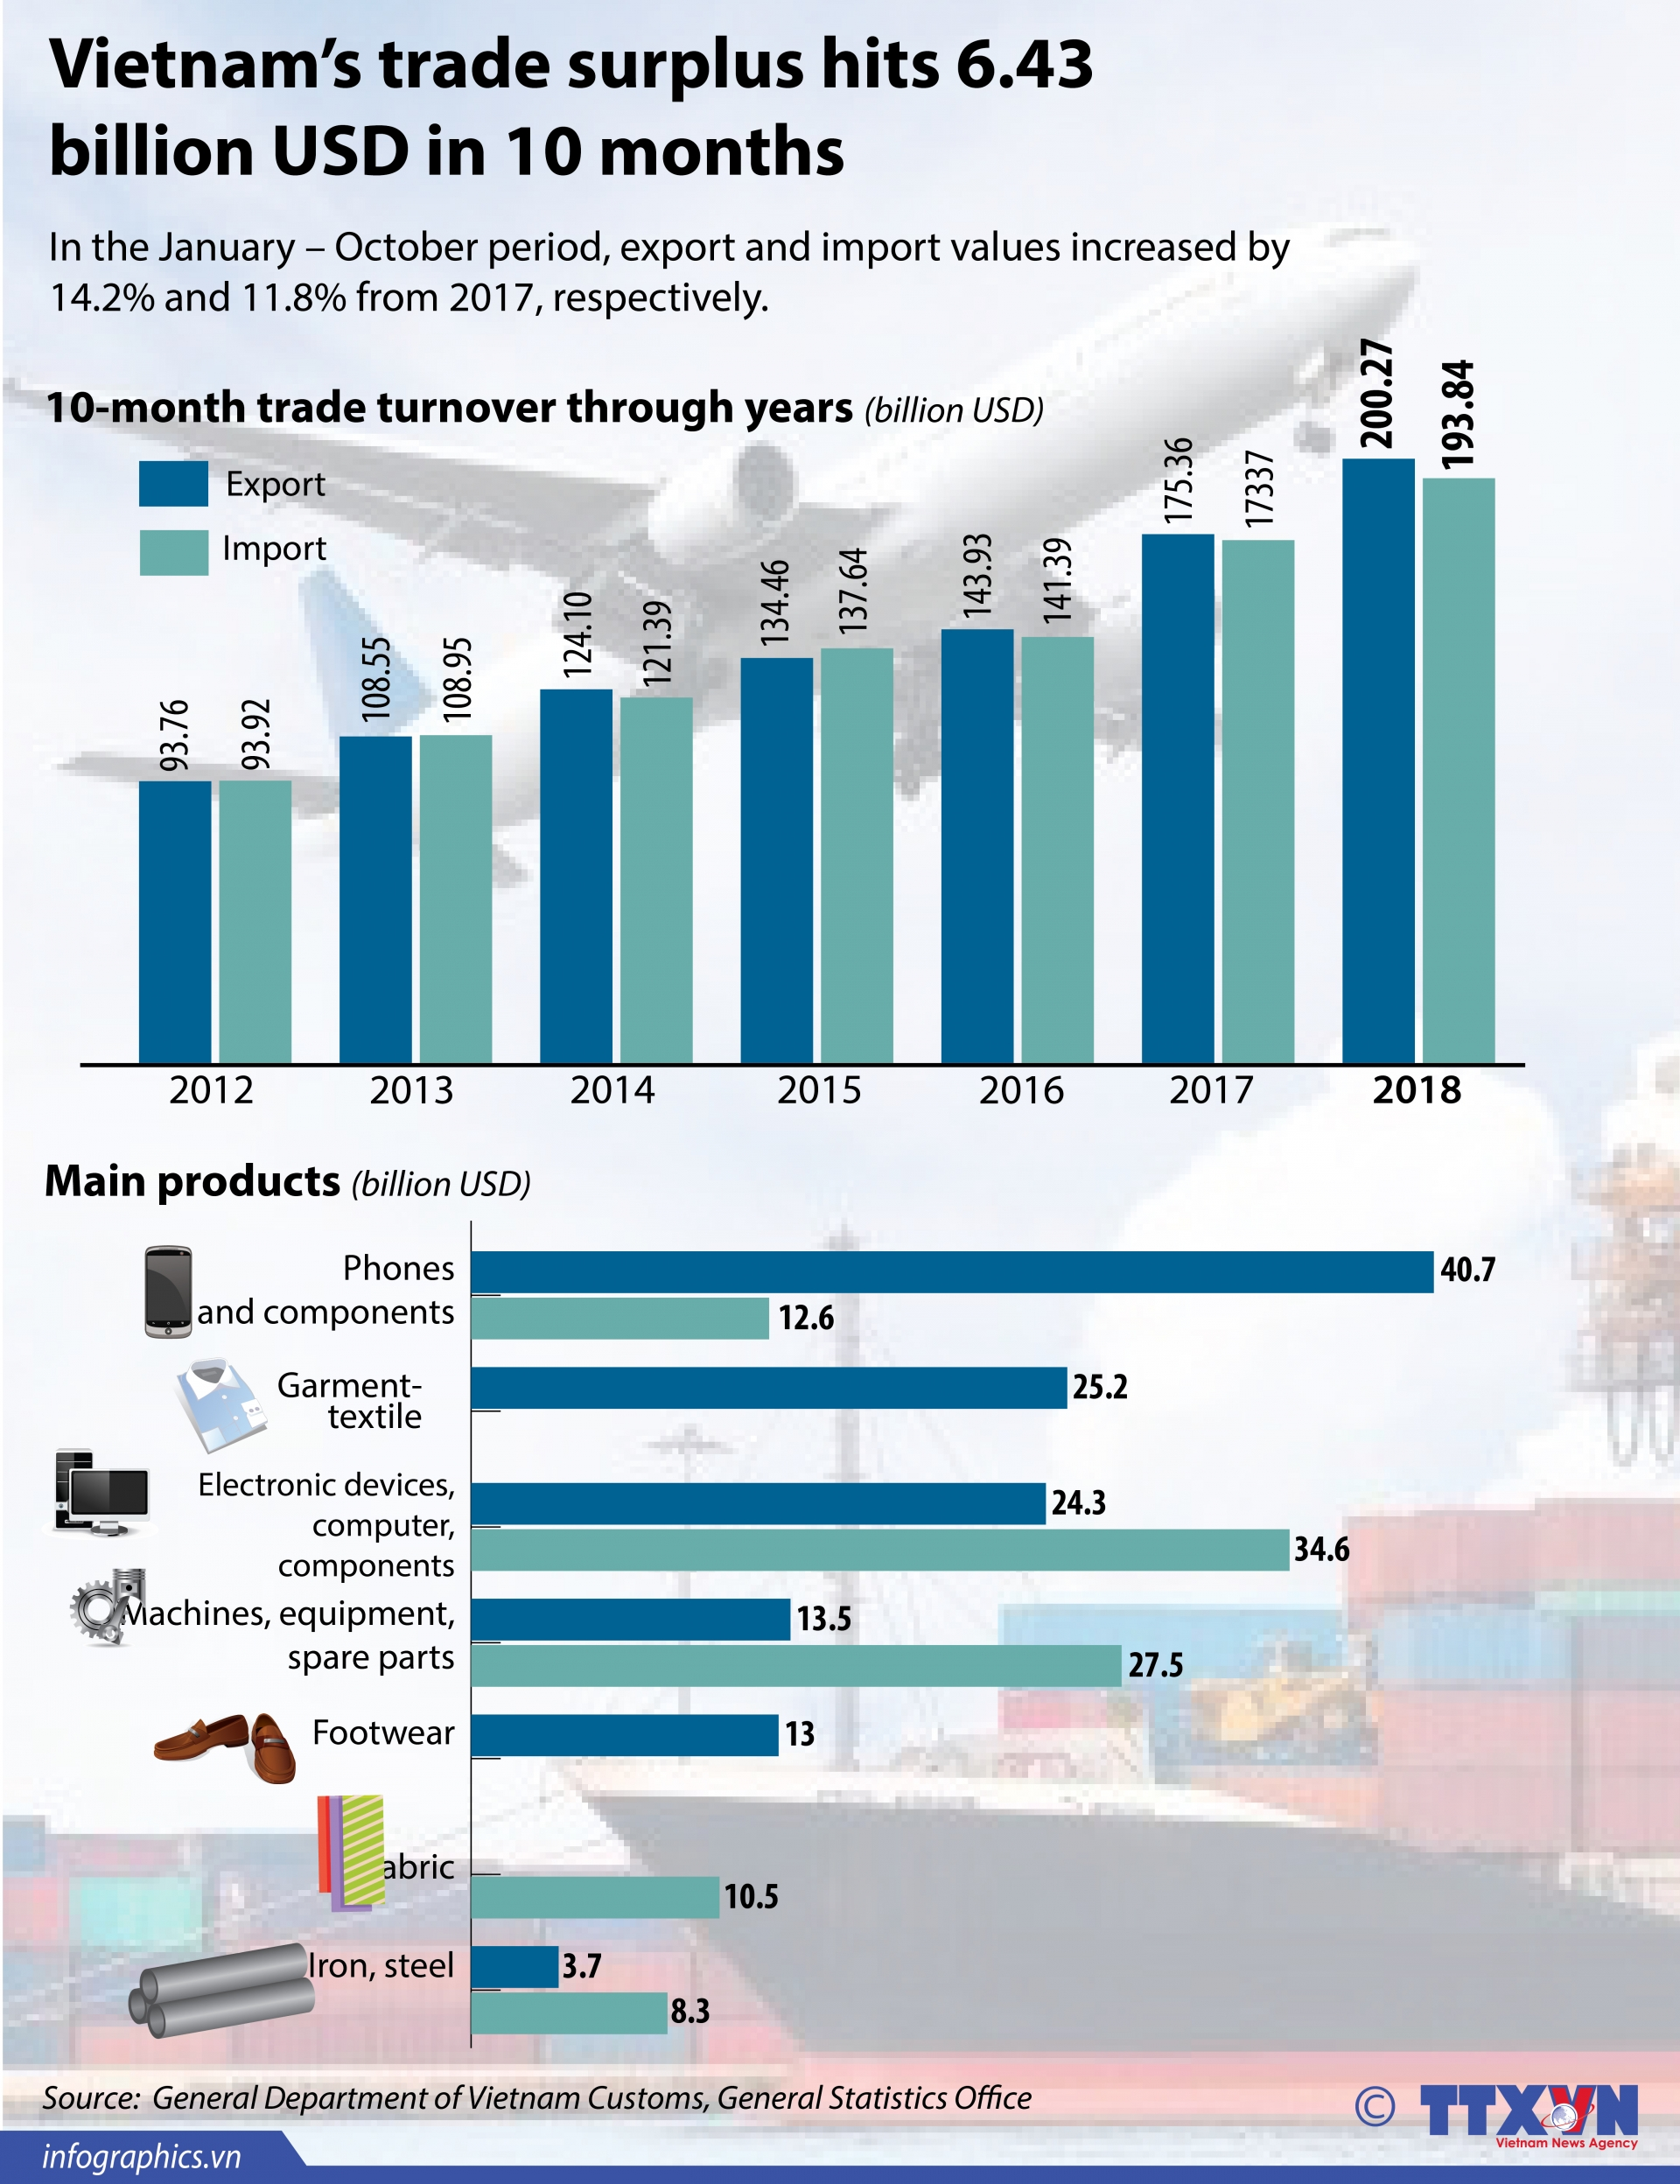 vietnams trade surplus hits 643 bln in 10 months